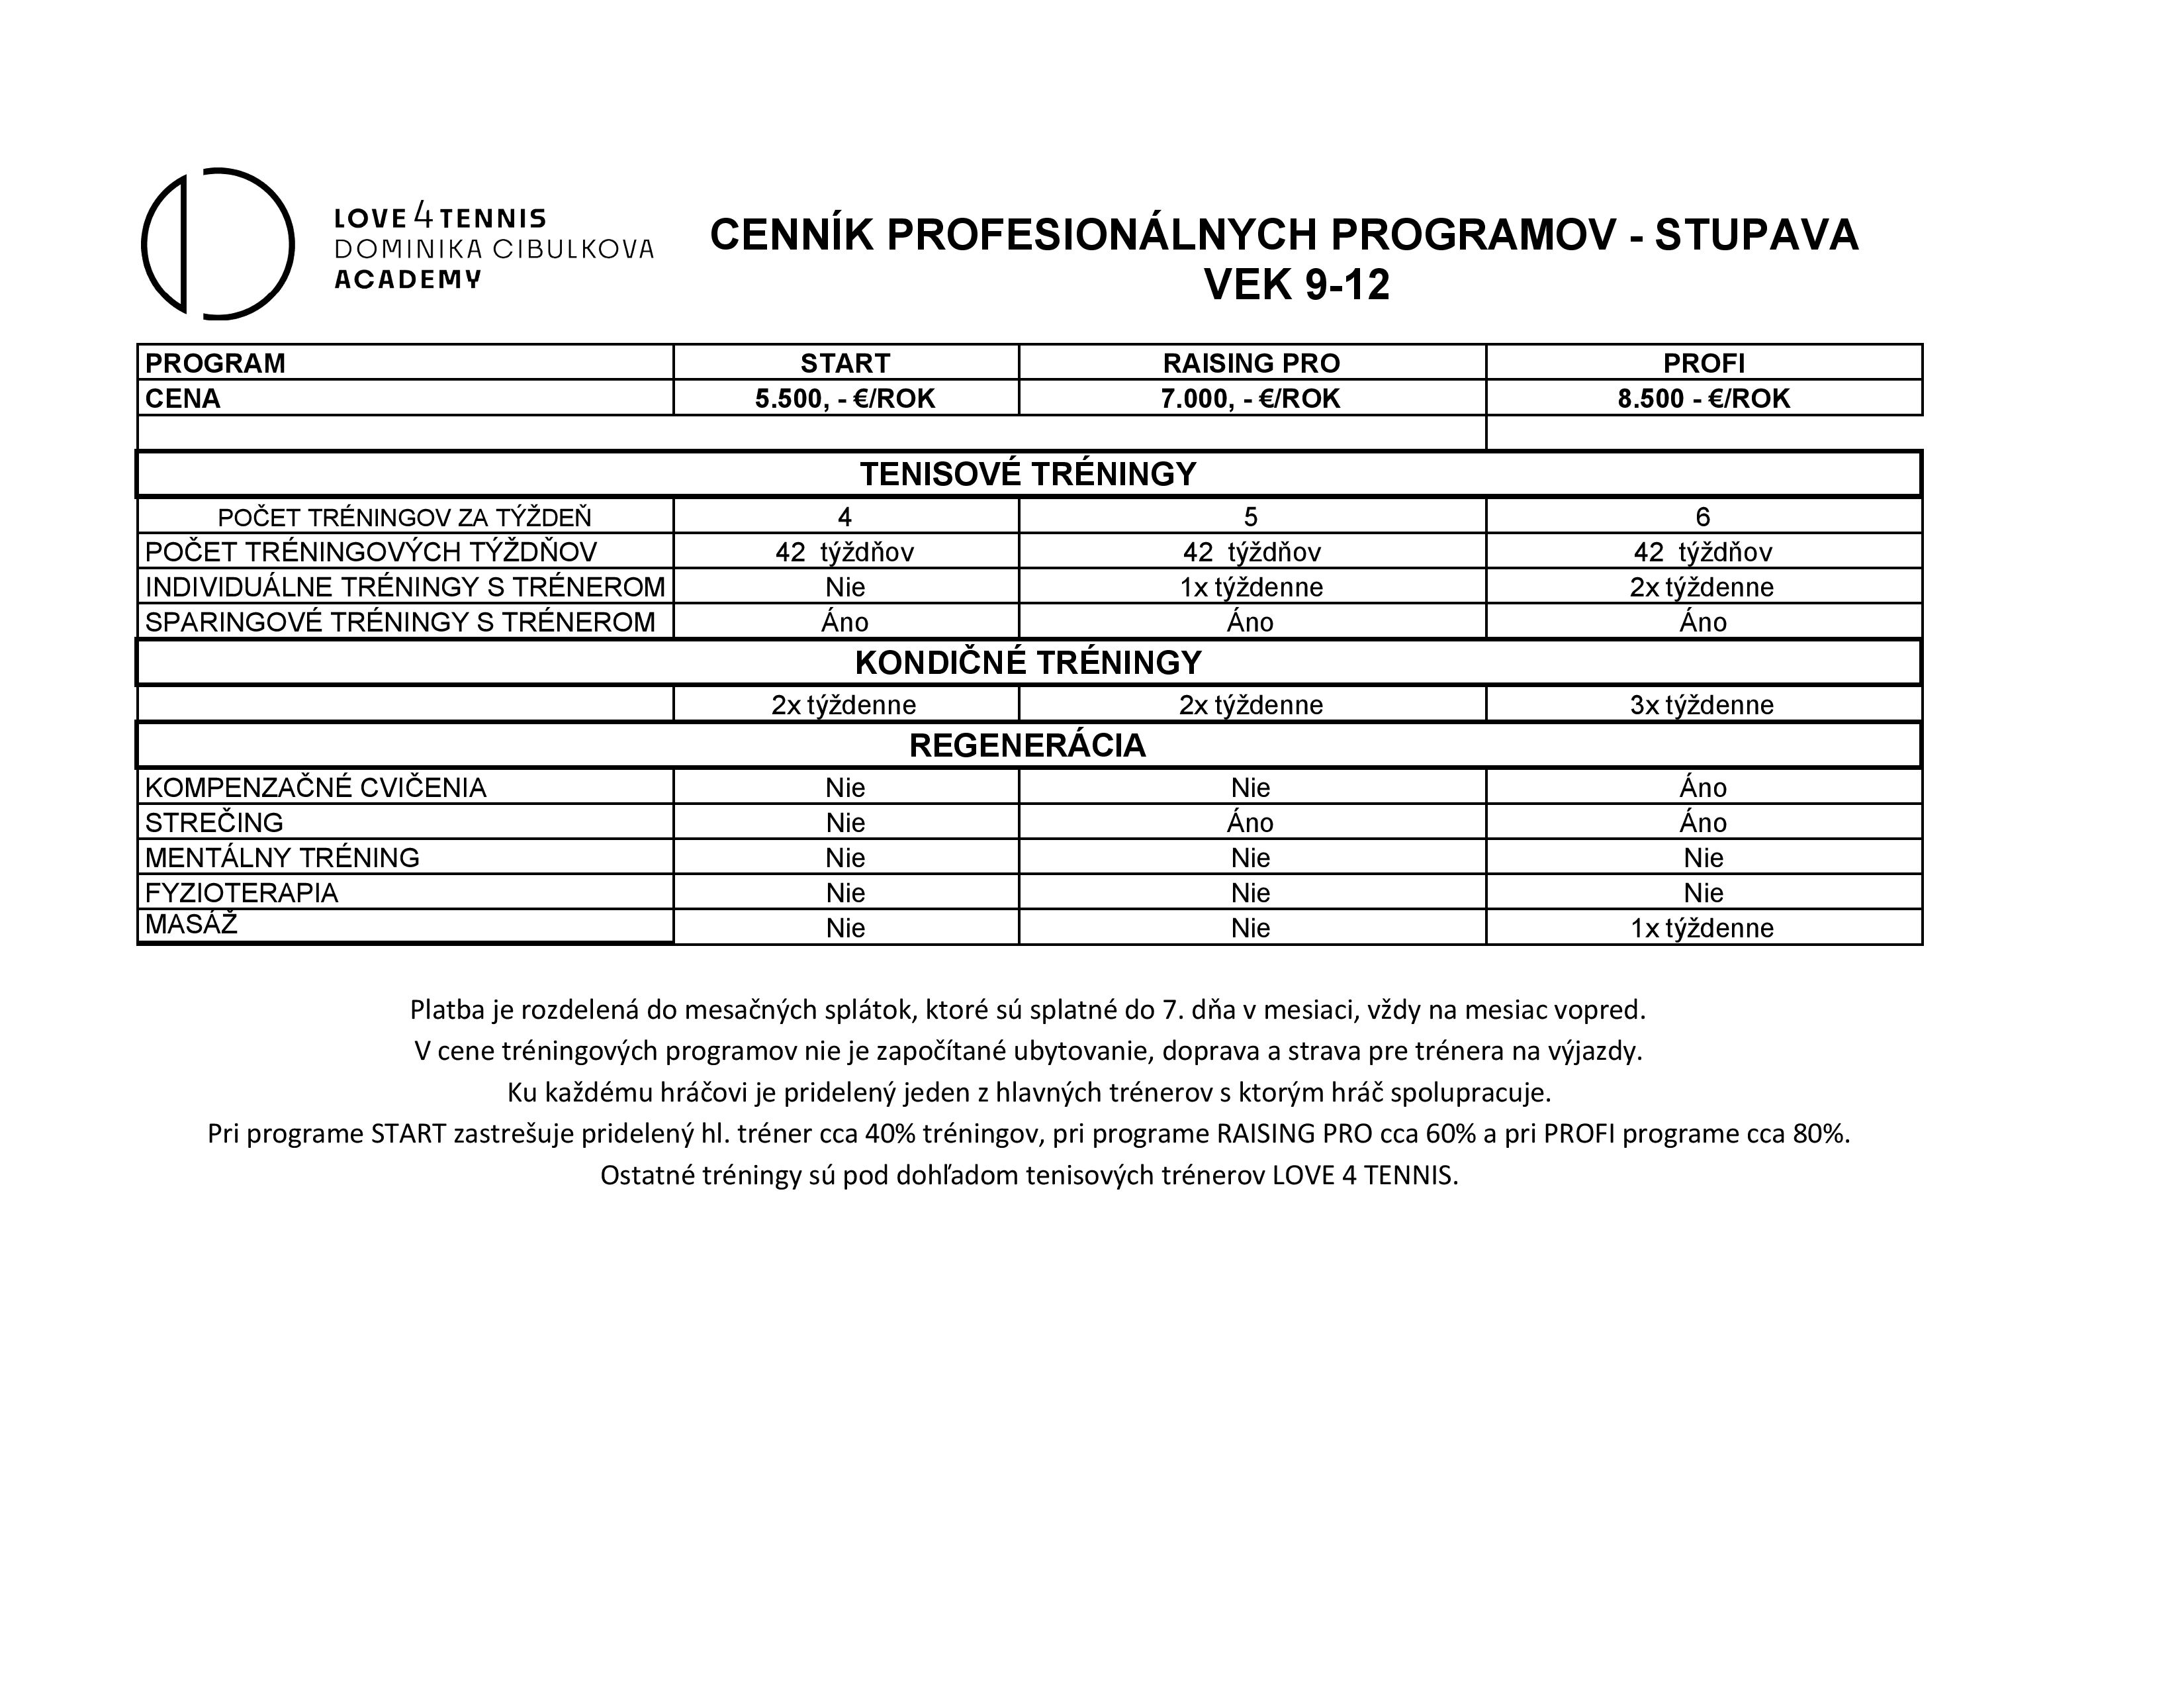 _Price list academy - SK.xls - School_2 (1)